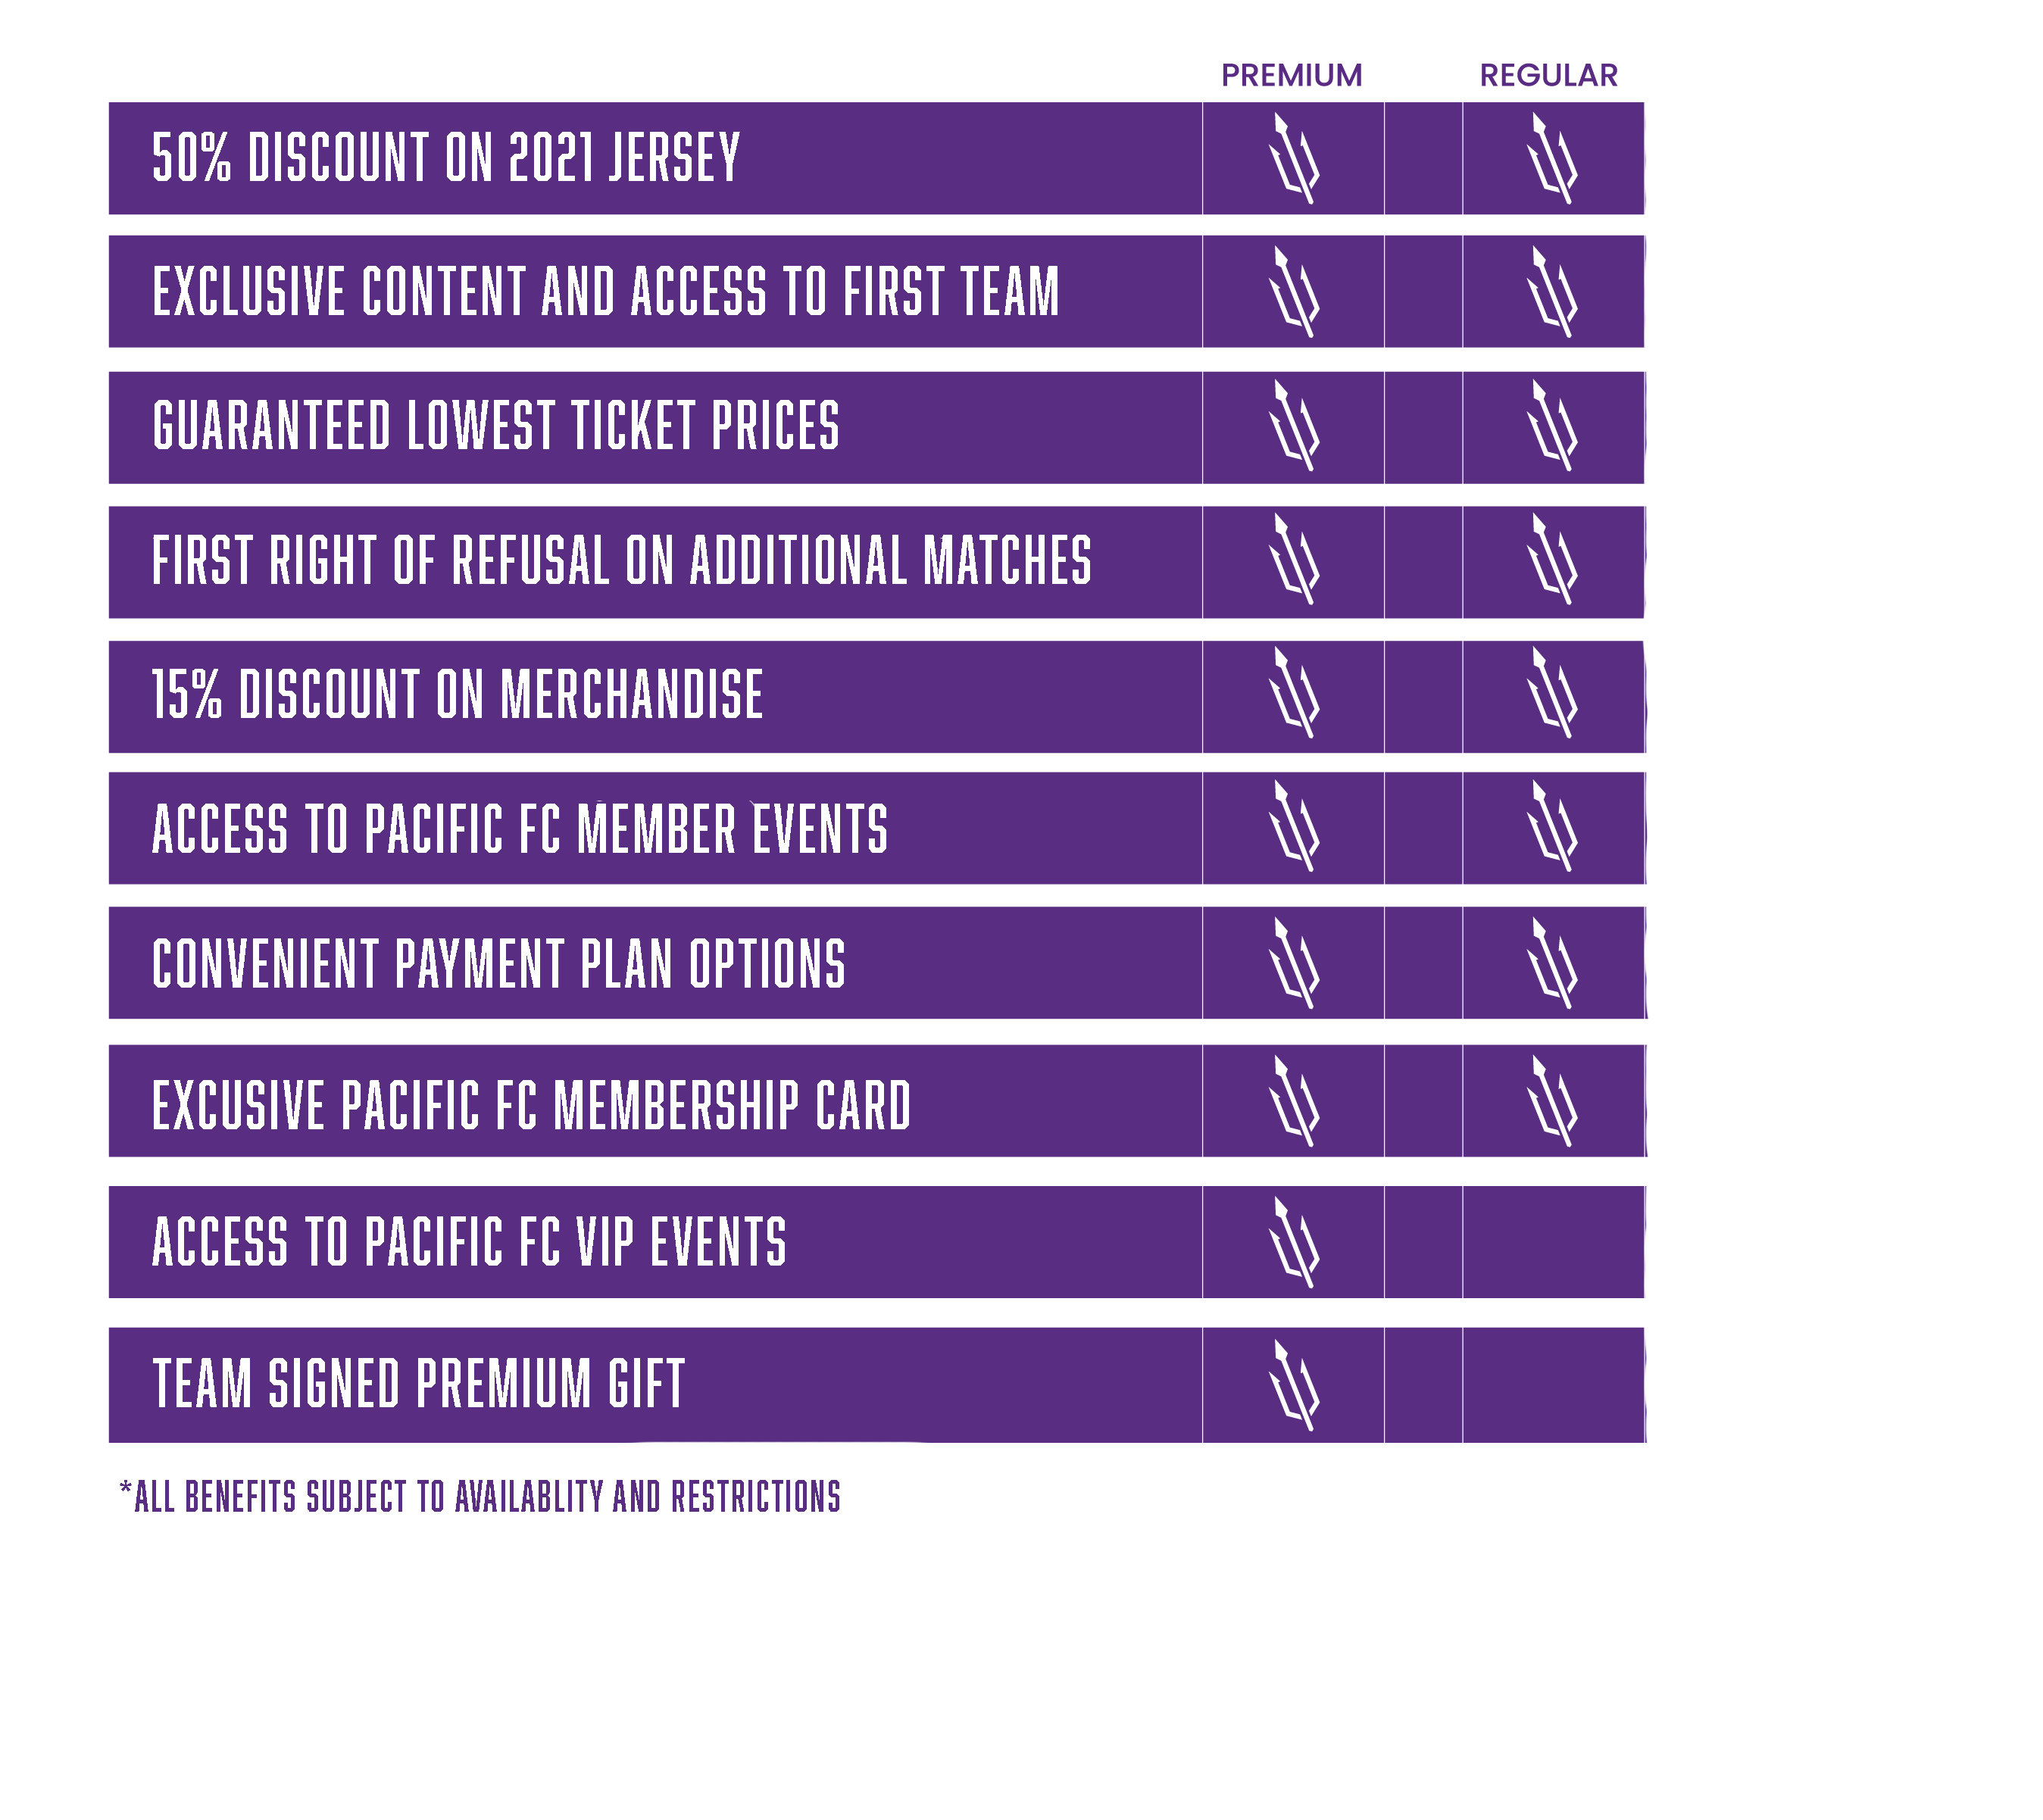 2021 NEW Season Member Benefits